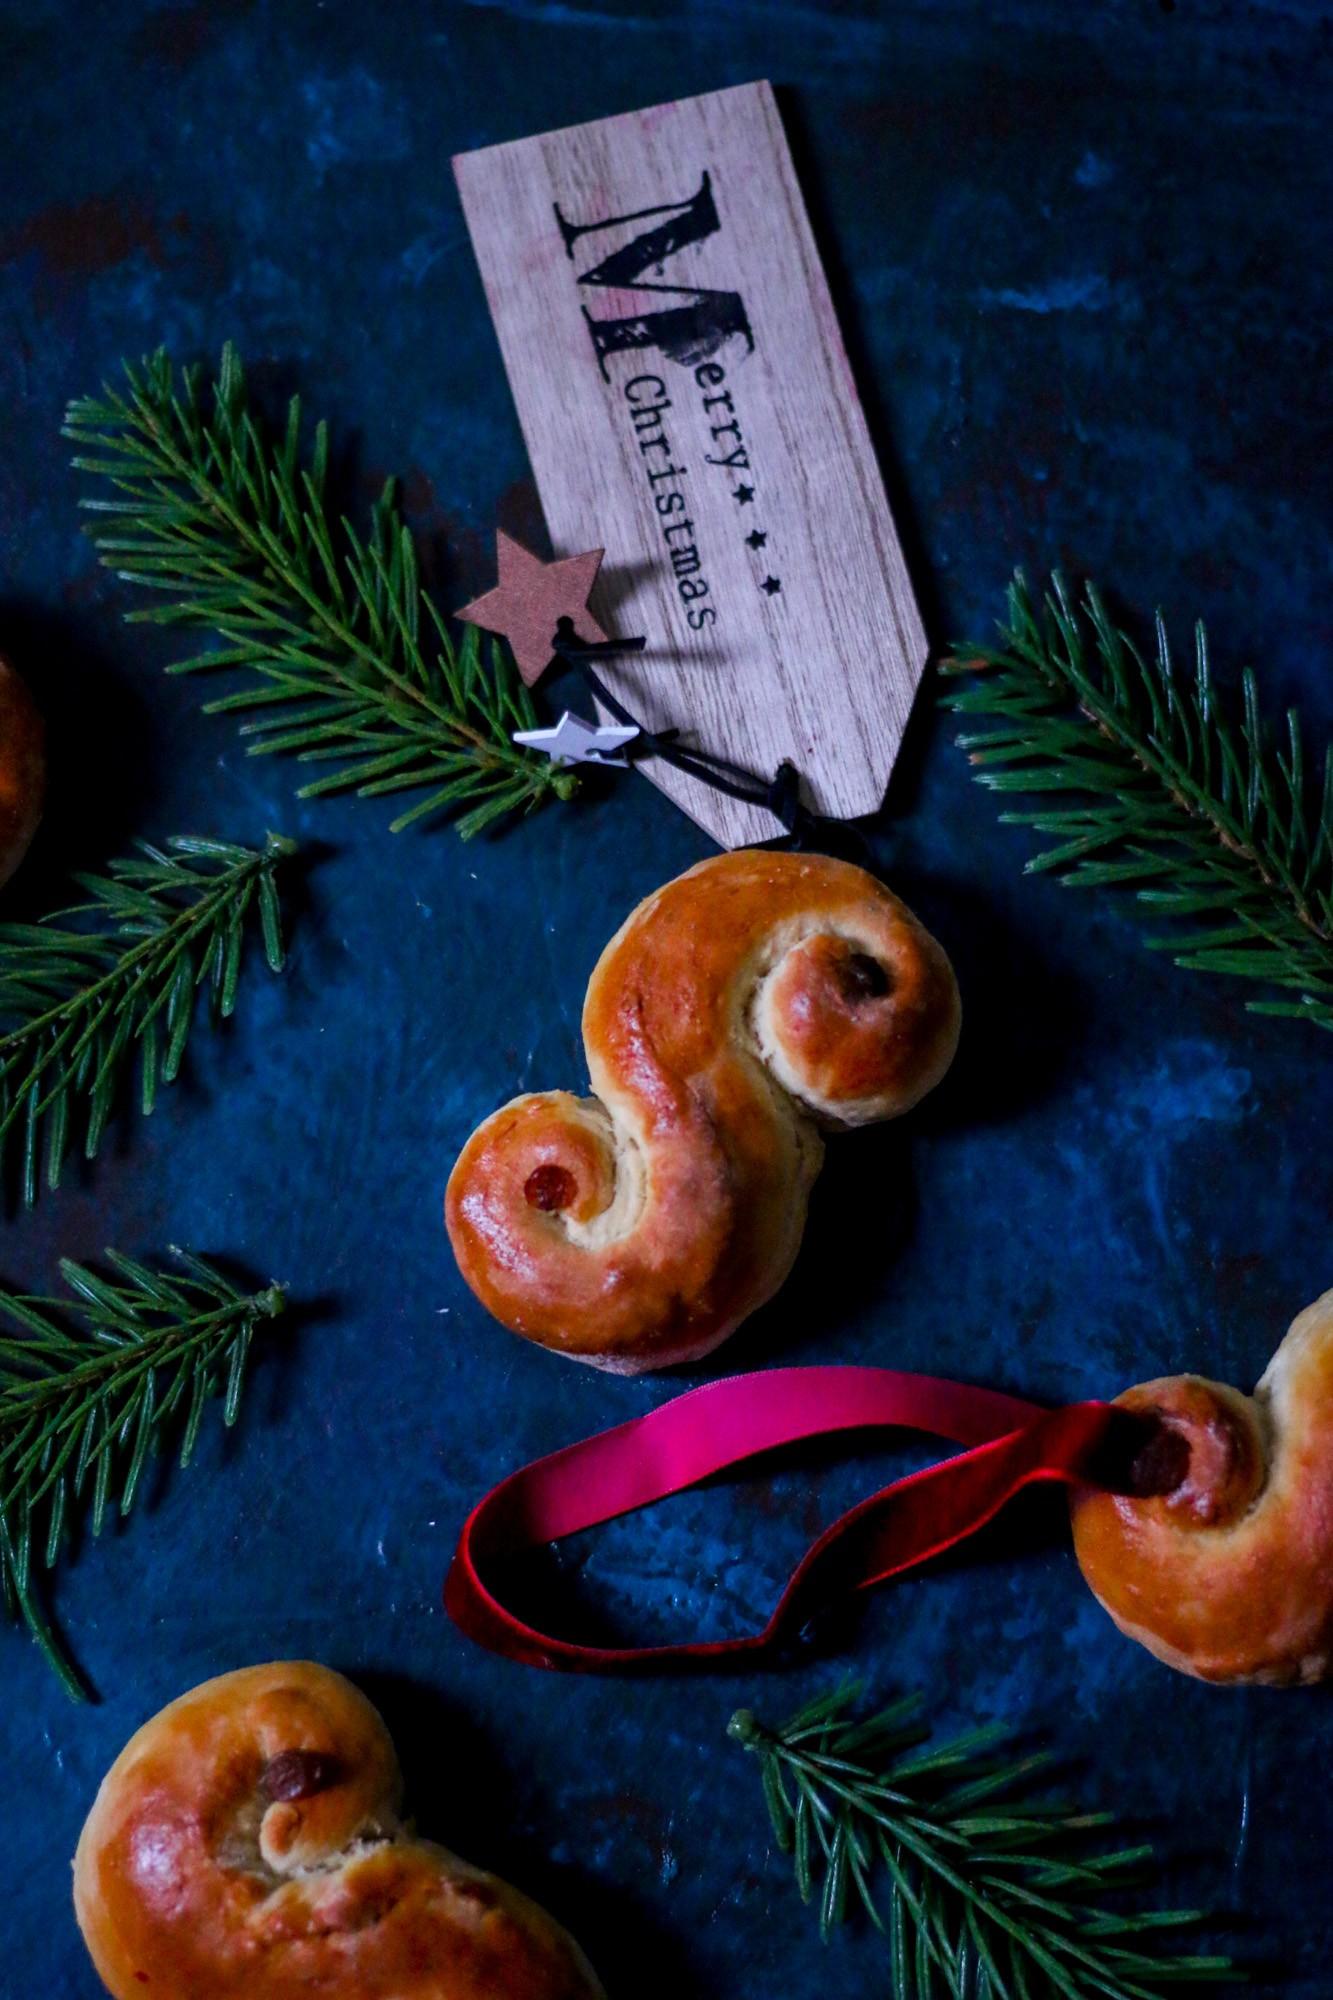 lussekatter-st-lucia-saffron-buns-christmas-cookbook-melissa-ofoedu-photography-for-a-sweet-point-of-view-7-von-1